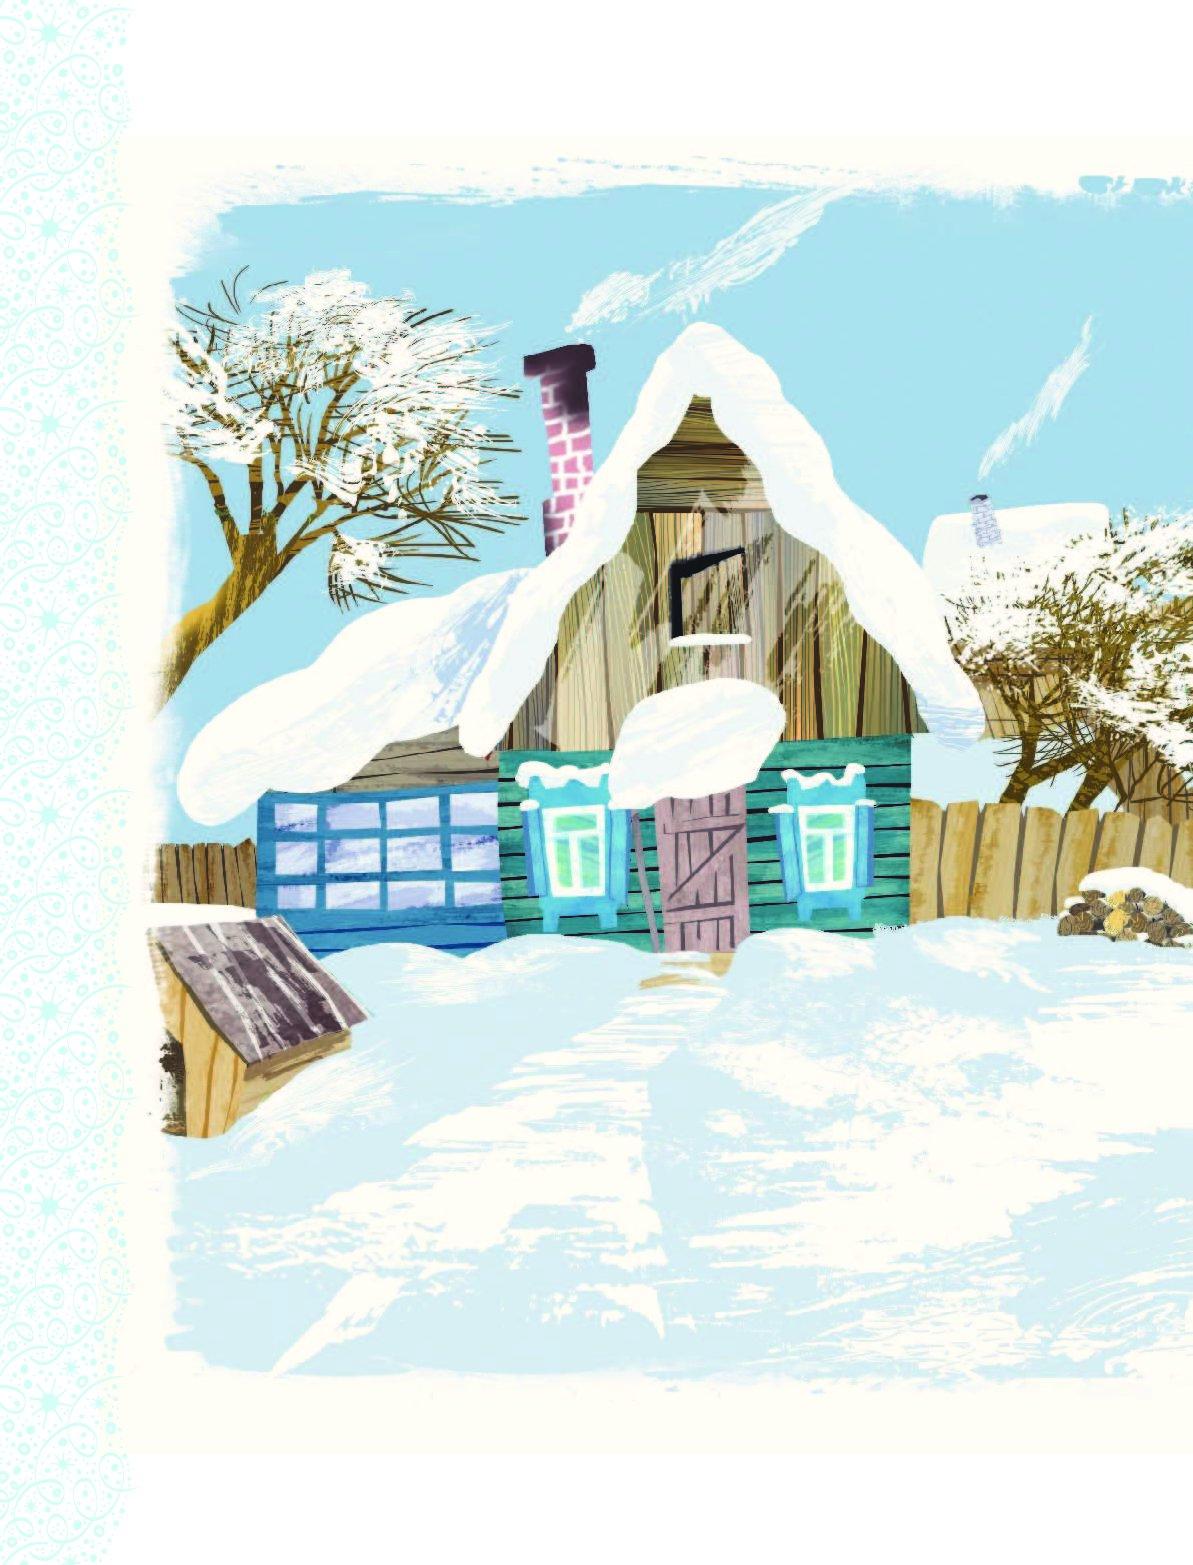 Зима в простоквашино картинки